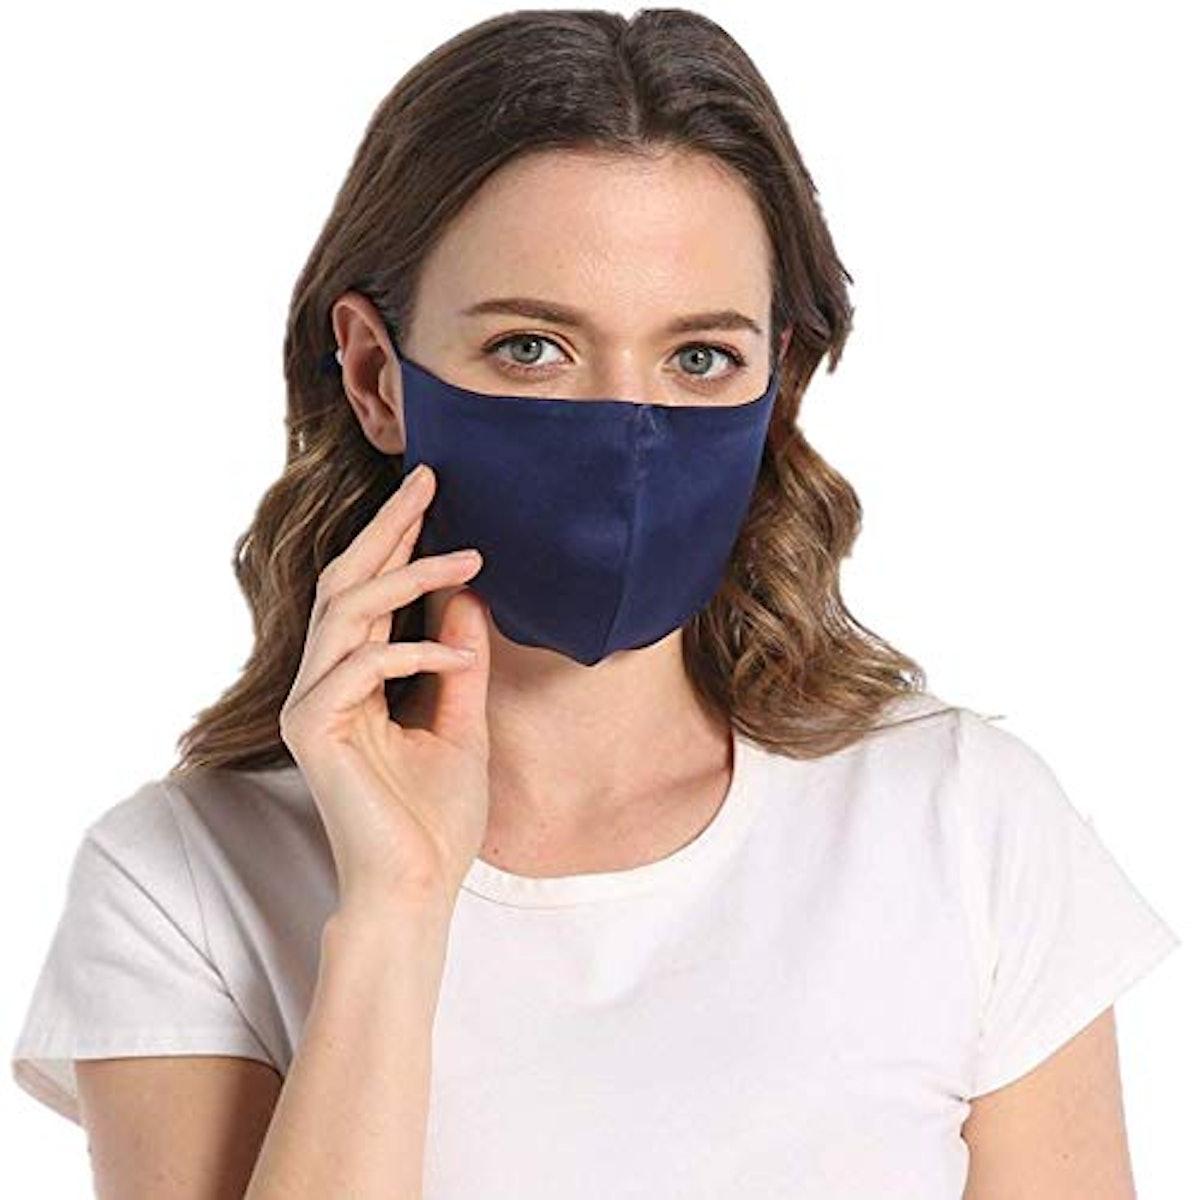 ROSEWARD 100% Mulberry Silk Face Adjustable Mask with Filter Pocket